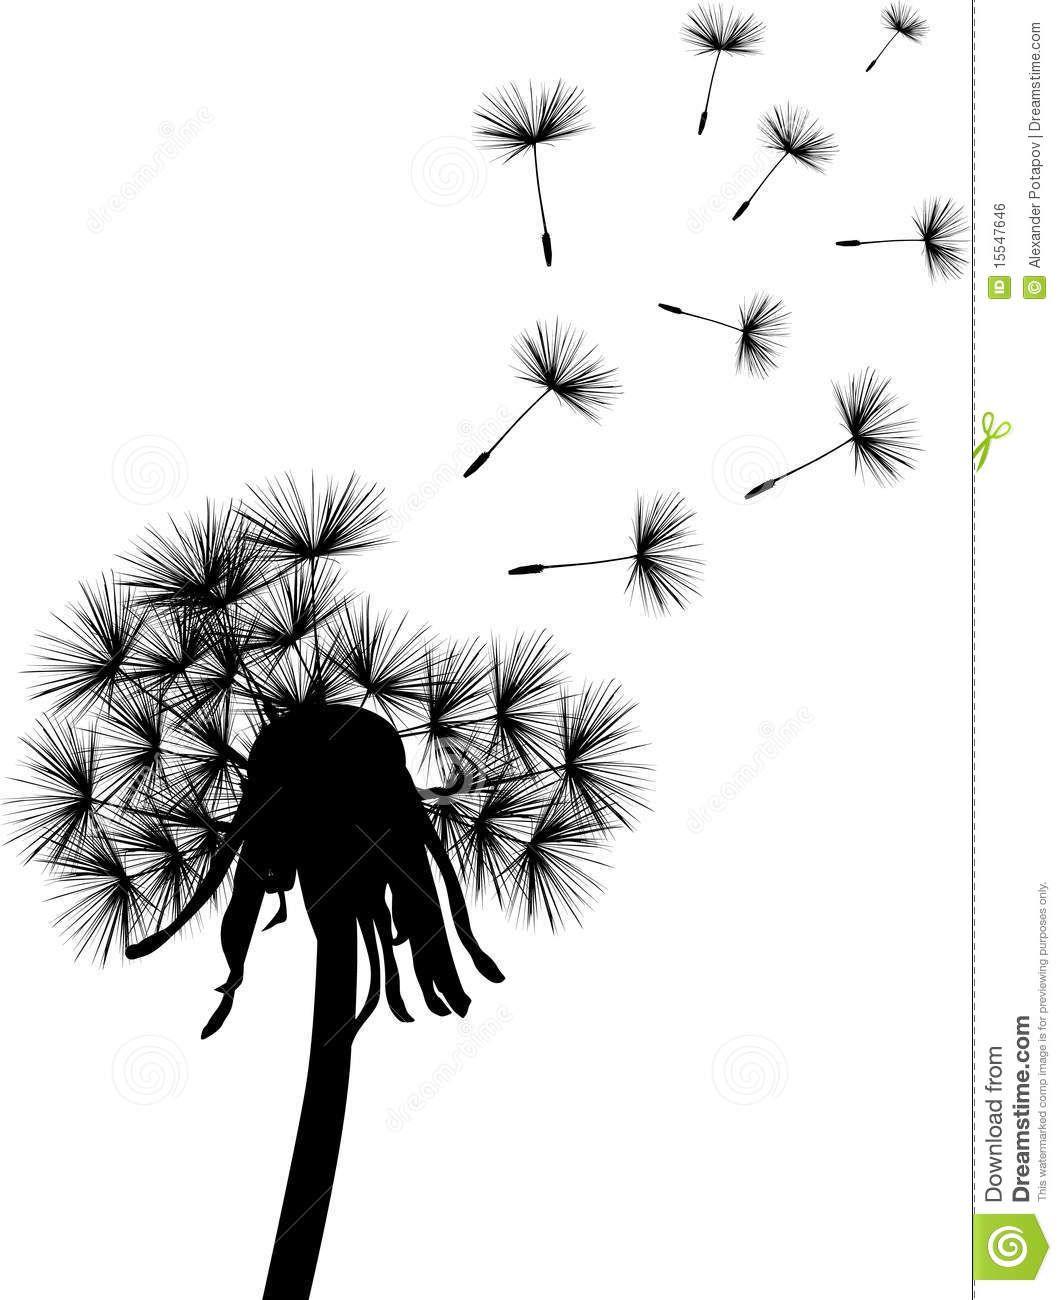 Black Dandelion Plant Royalty Free Stock Image Image 15547646 Dandelion Plant Dandelion Plants